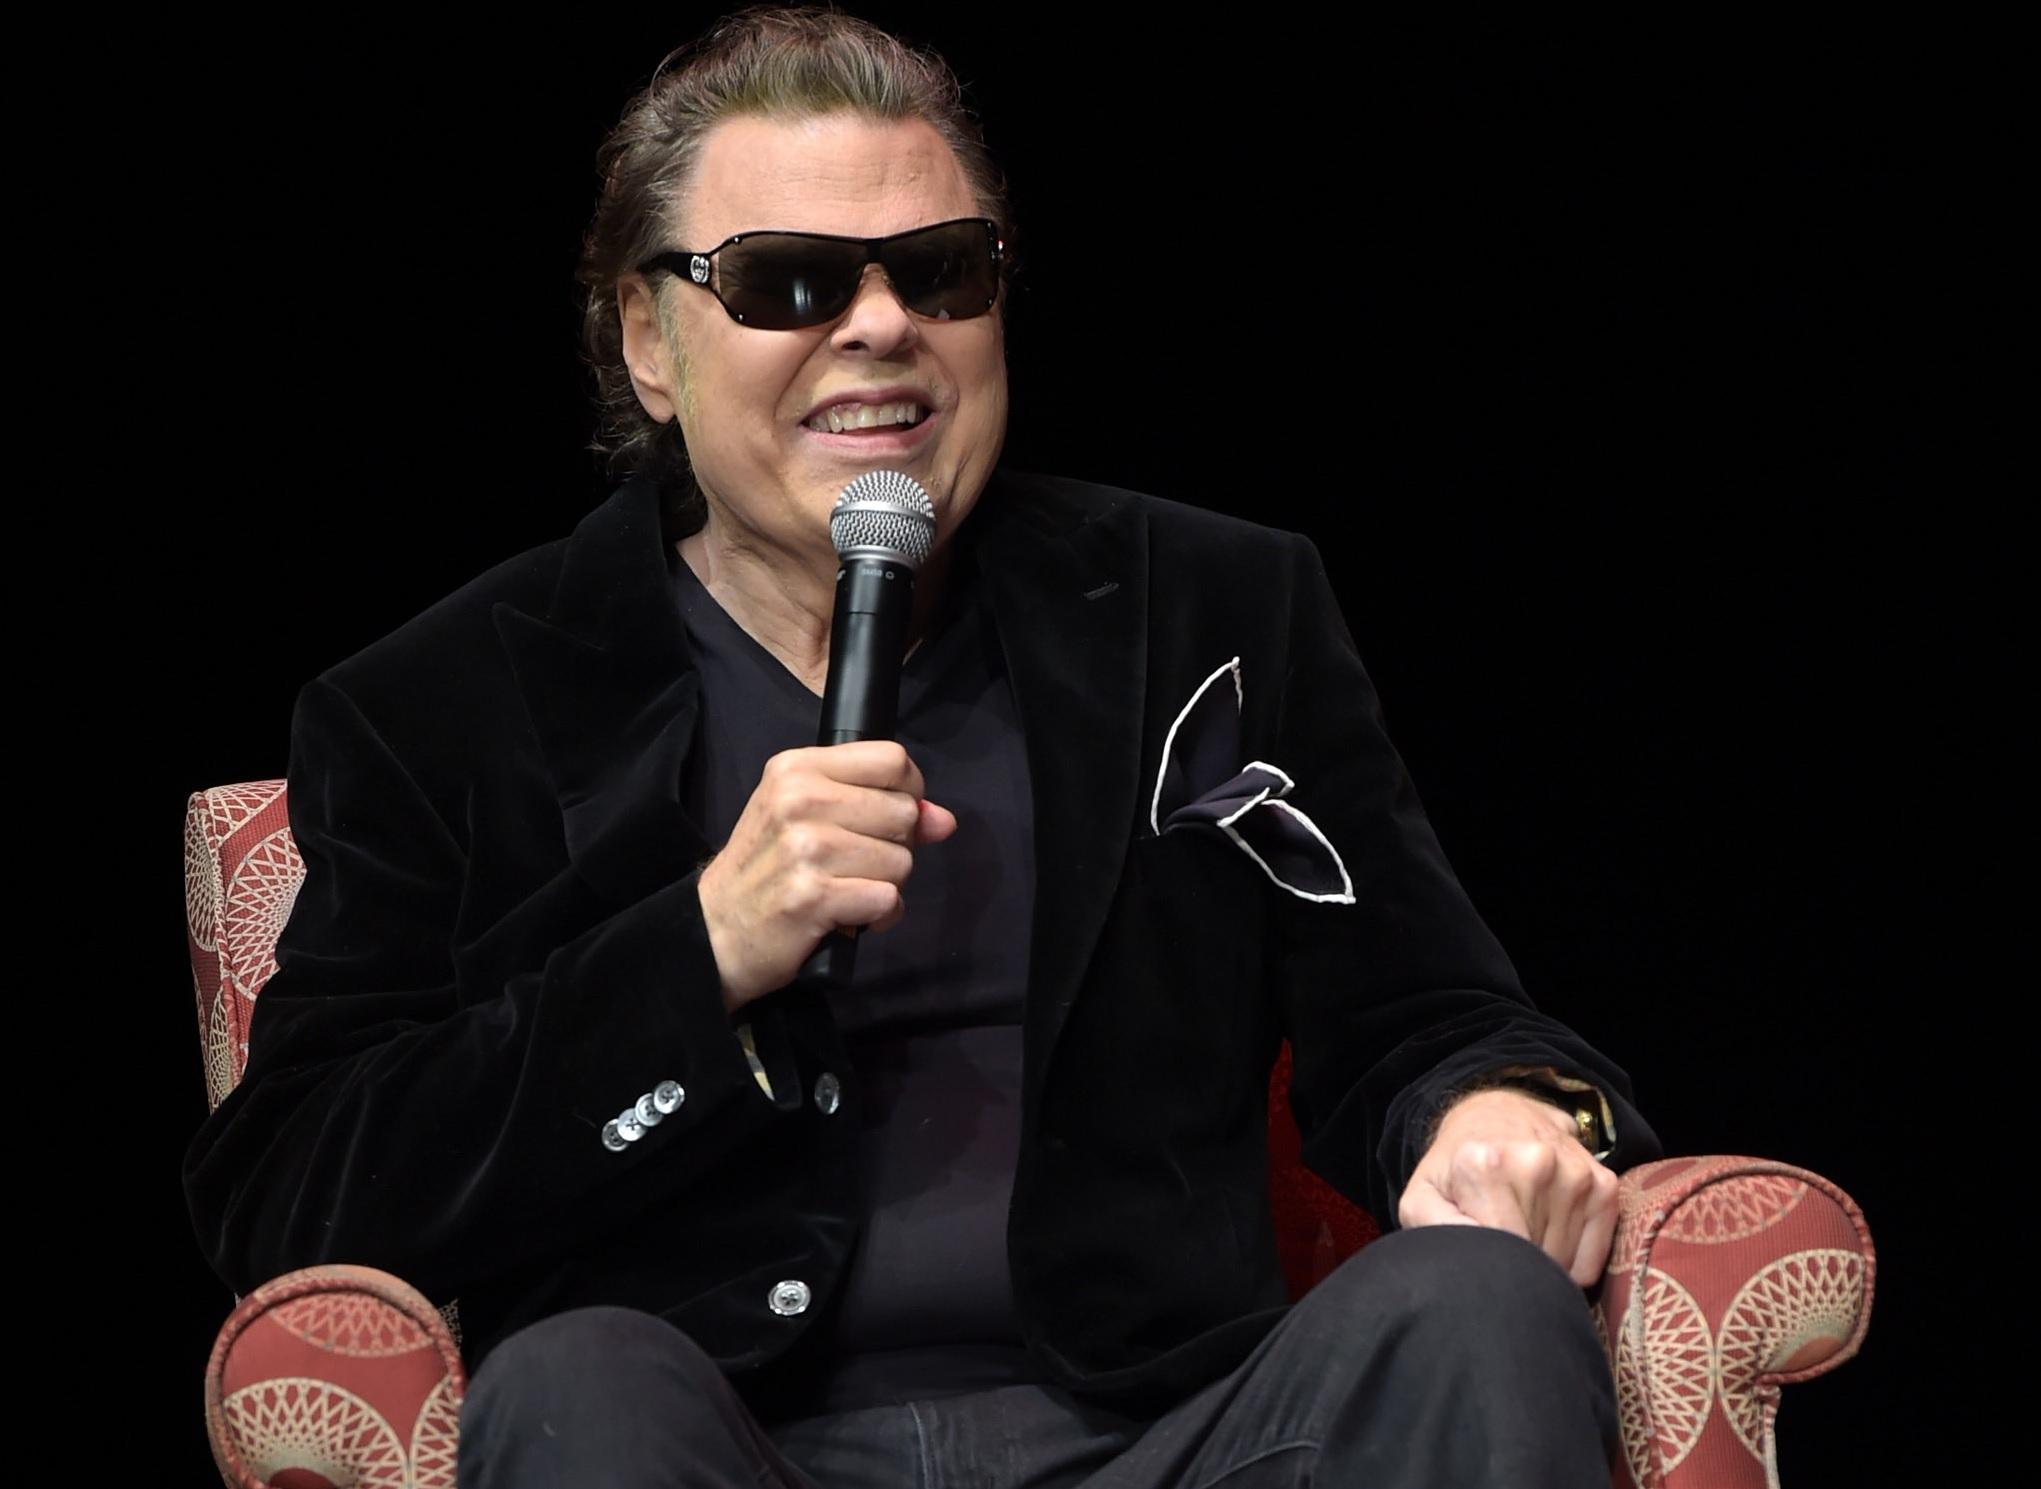 Ronnie Milsap Hospitalized Sounds Like Nashville